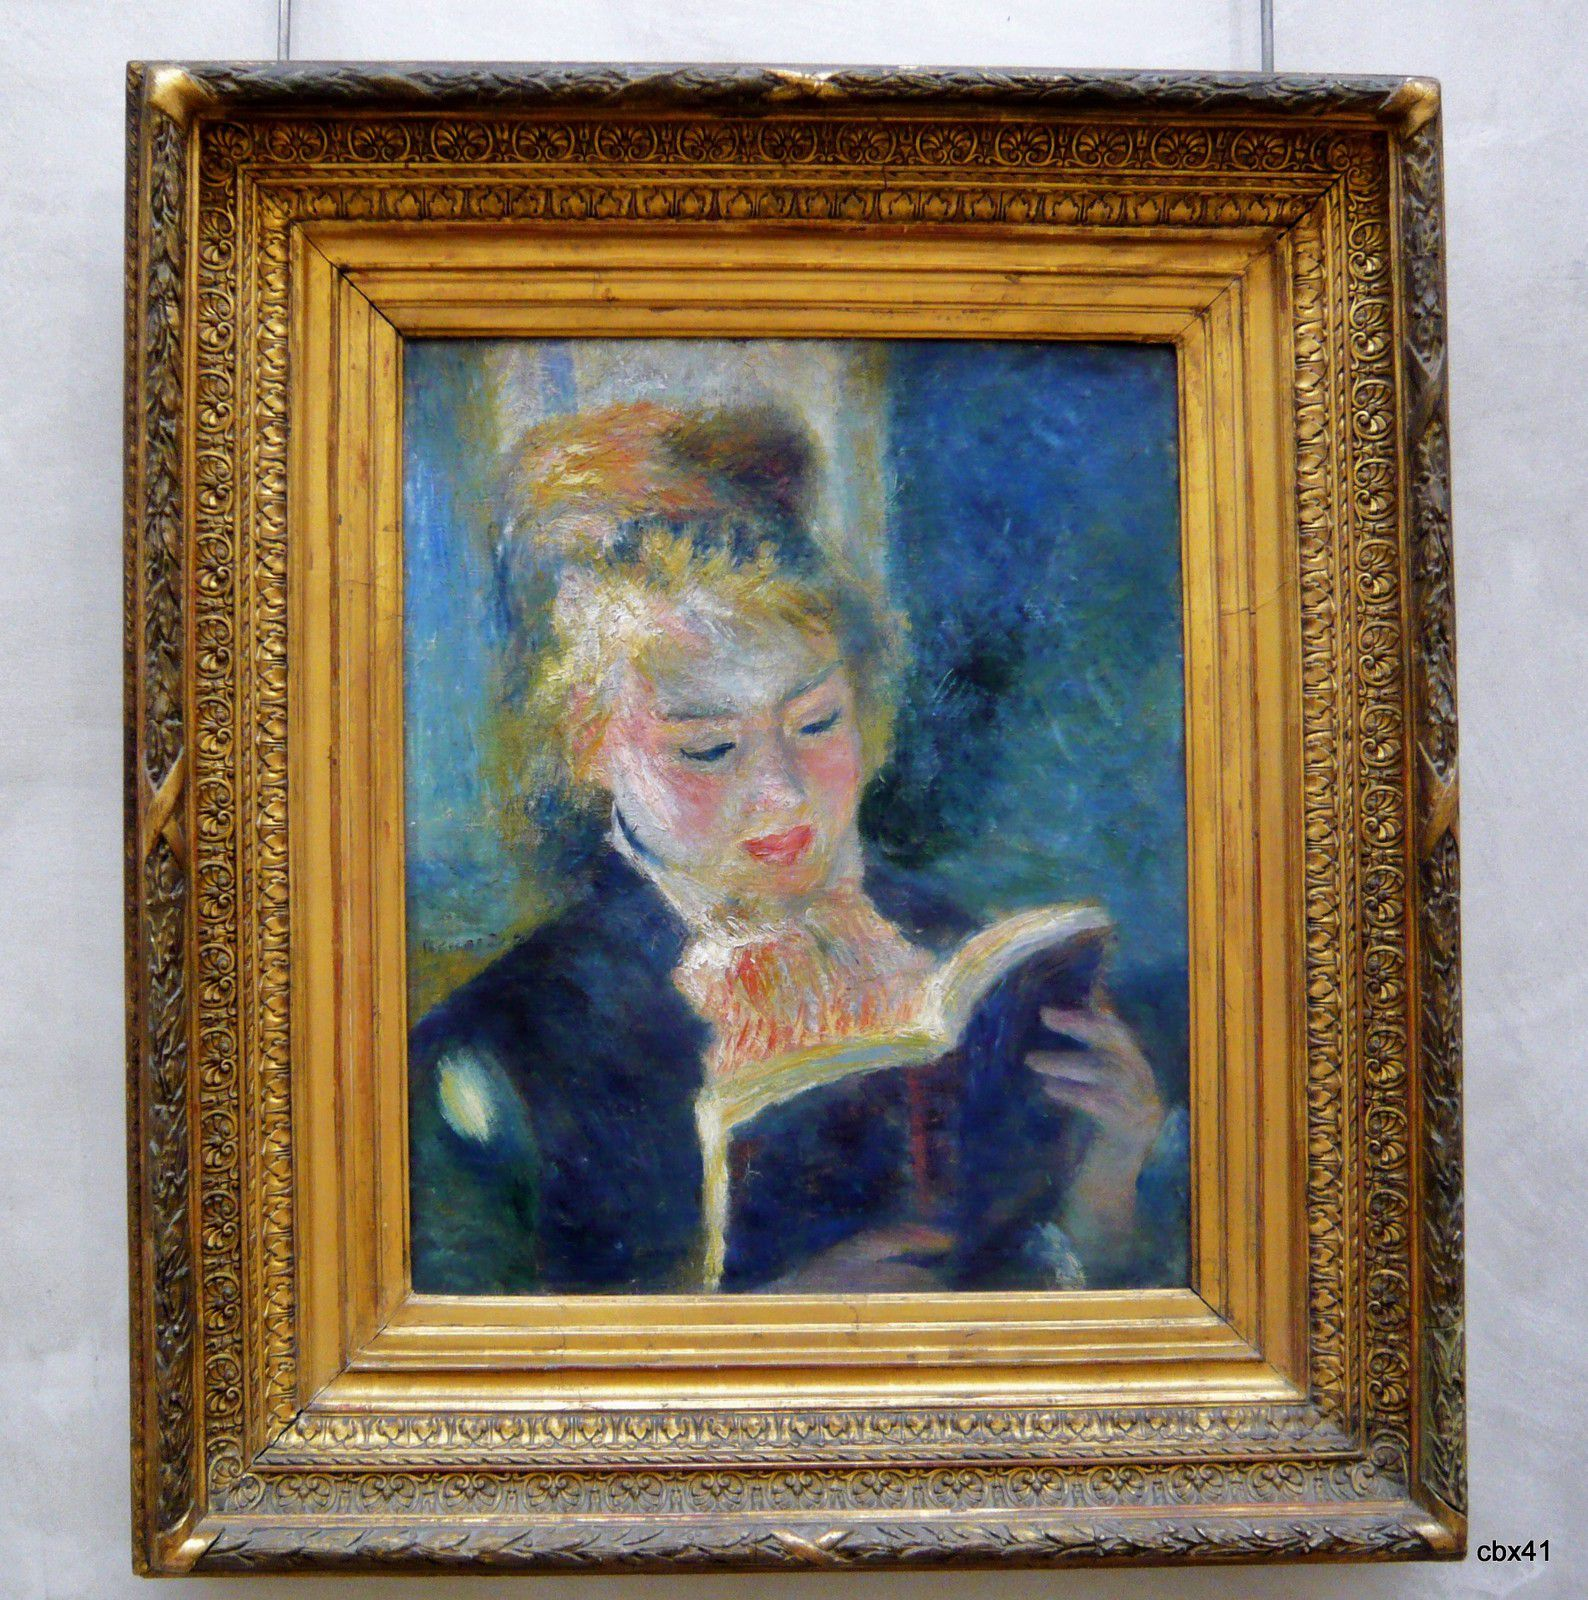 Pierre-Auguste Renoir, La liseuse